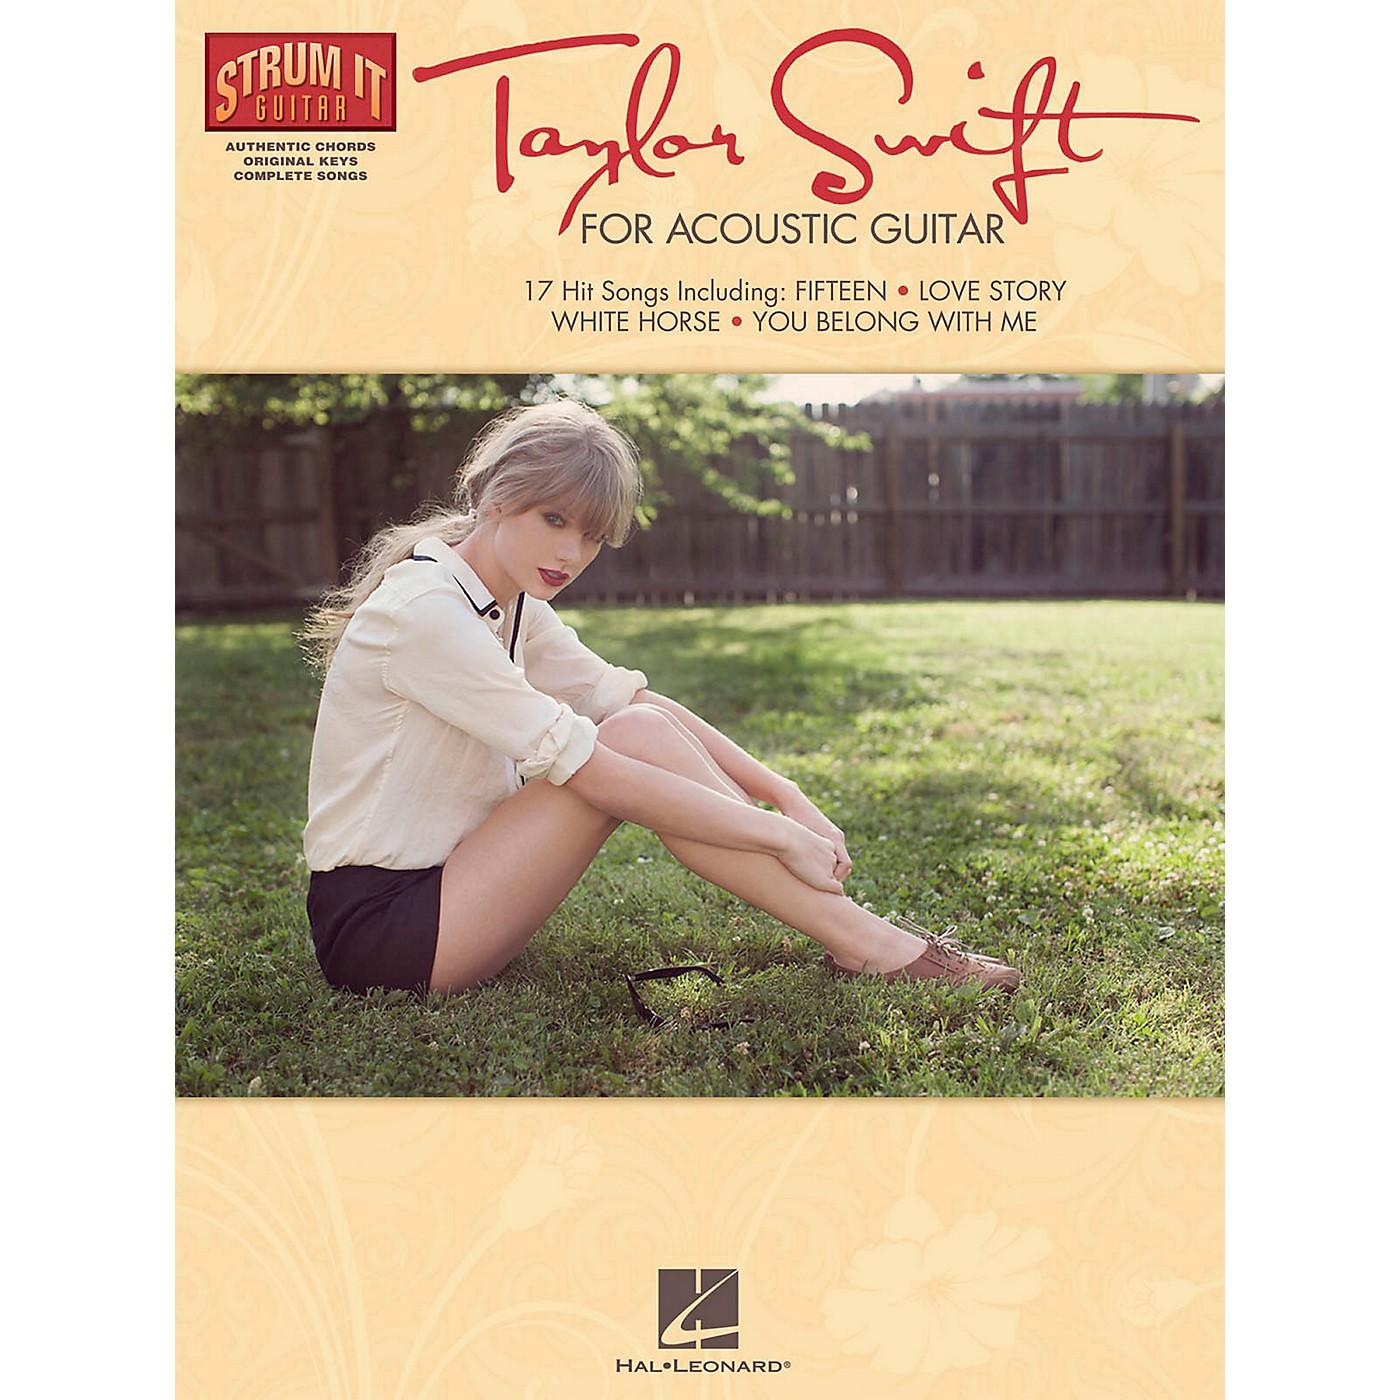 Hal Leonard Taylor Swift For Acoustic Guitar - Strum It Guitar Series thumbnail